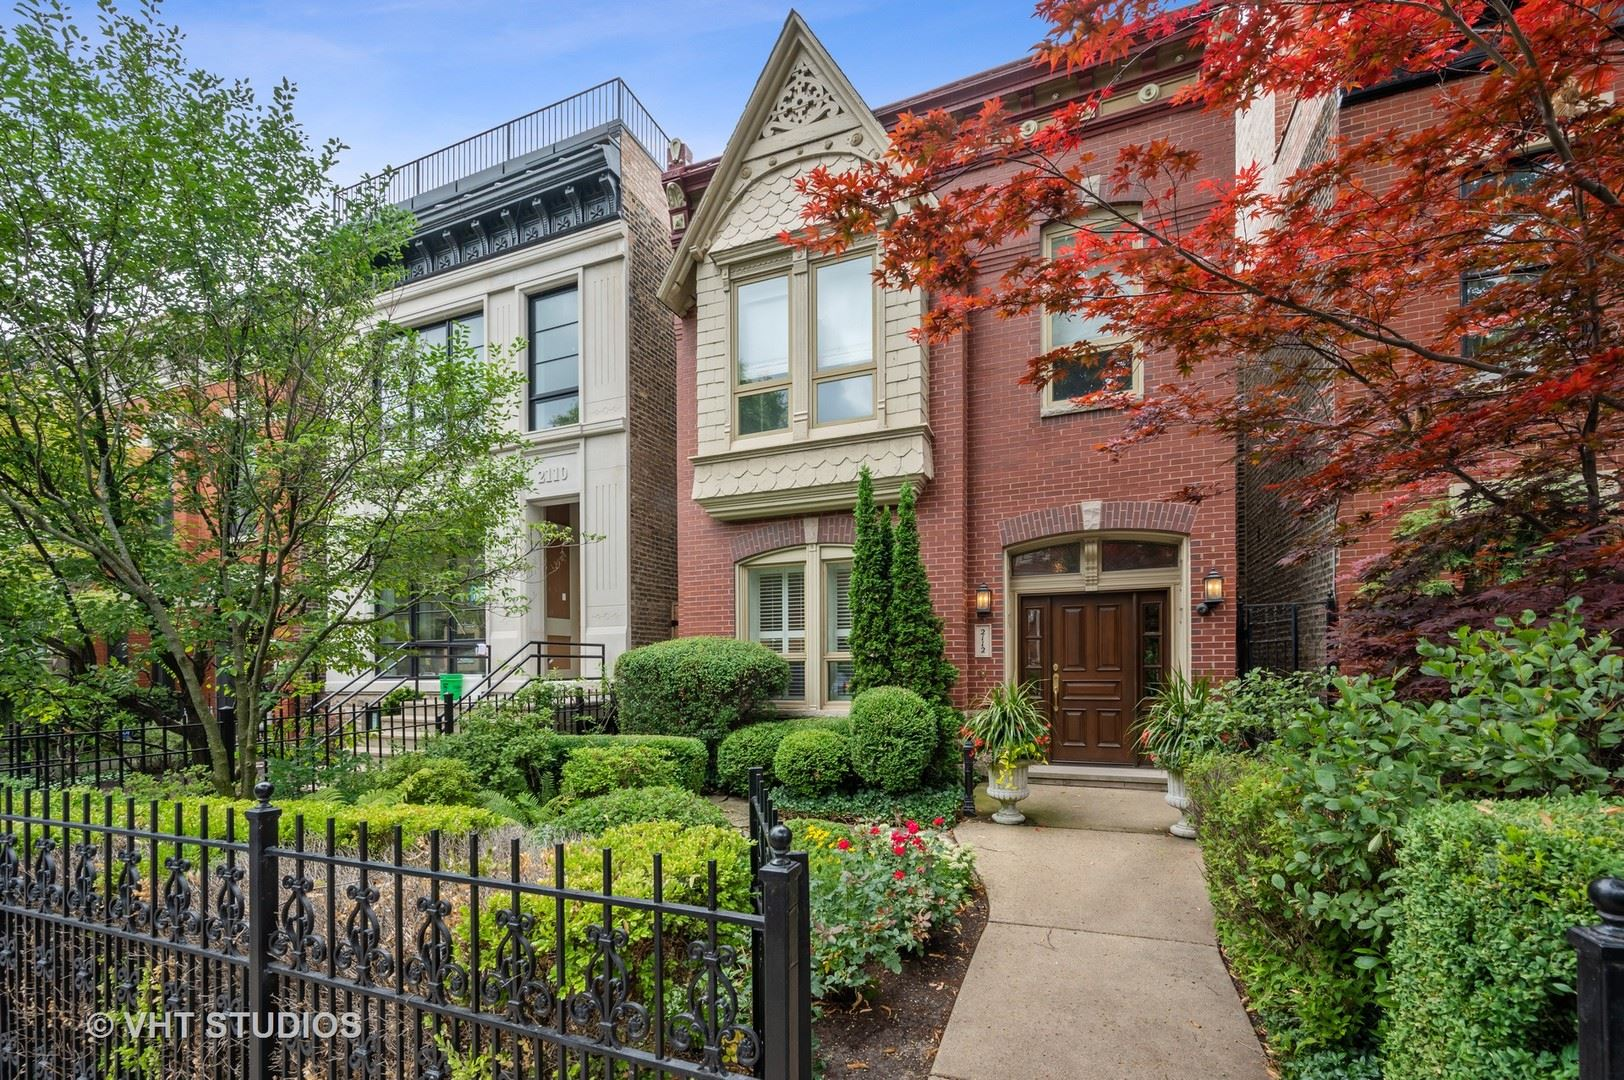 2112 N Clifton Avenue, Chicago, IL 60614 - #: 10800661